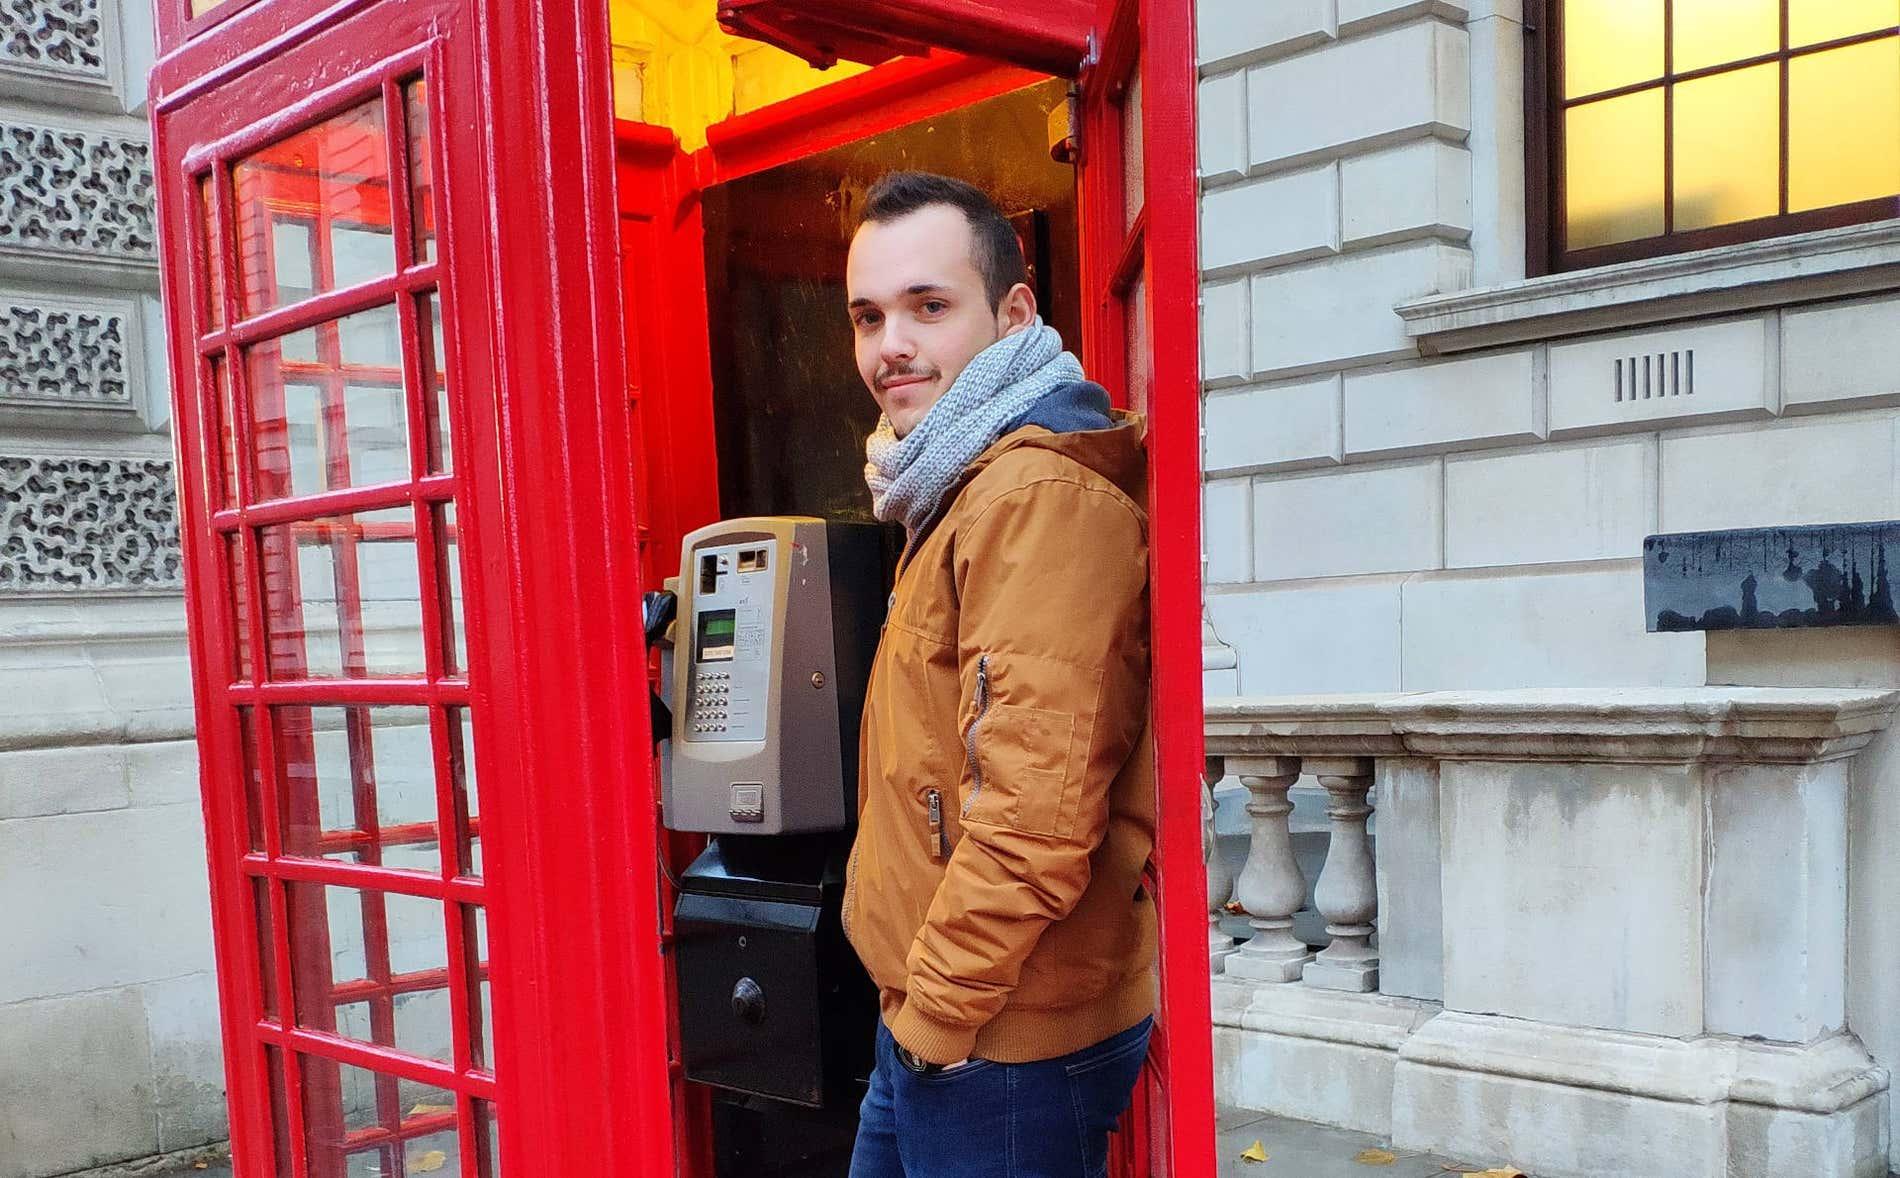 #CivitatisInsider: Jesús Rodríguez, Android development specialist